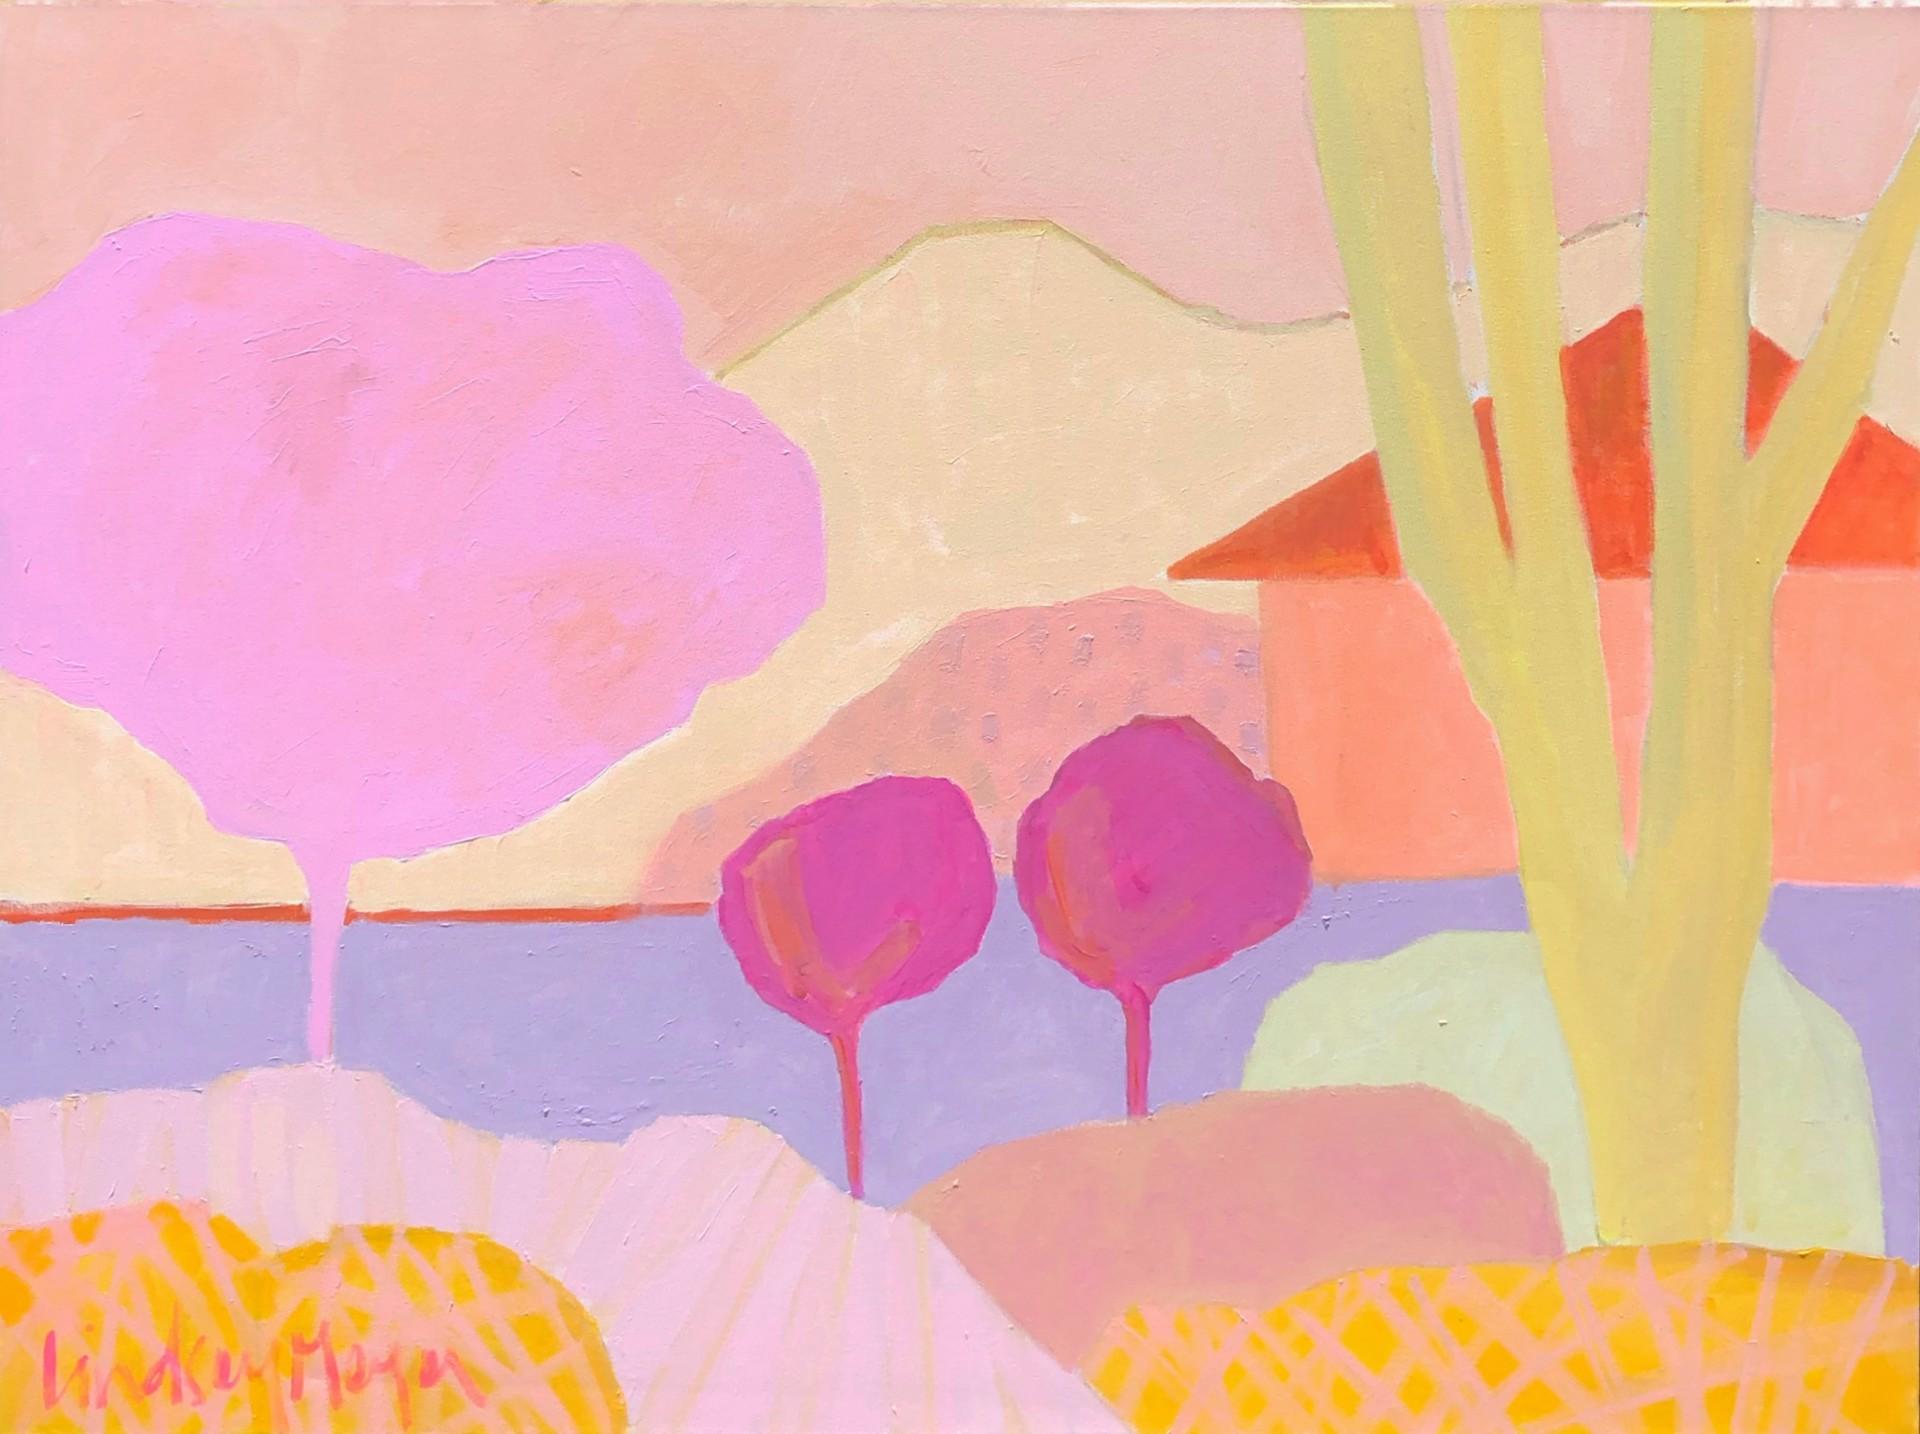 Steady Stream by Lindsey Meyer